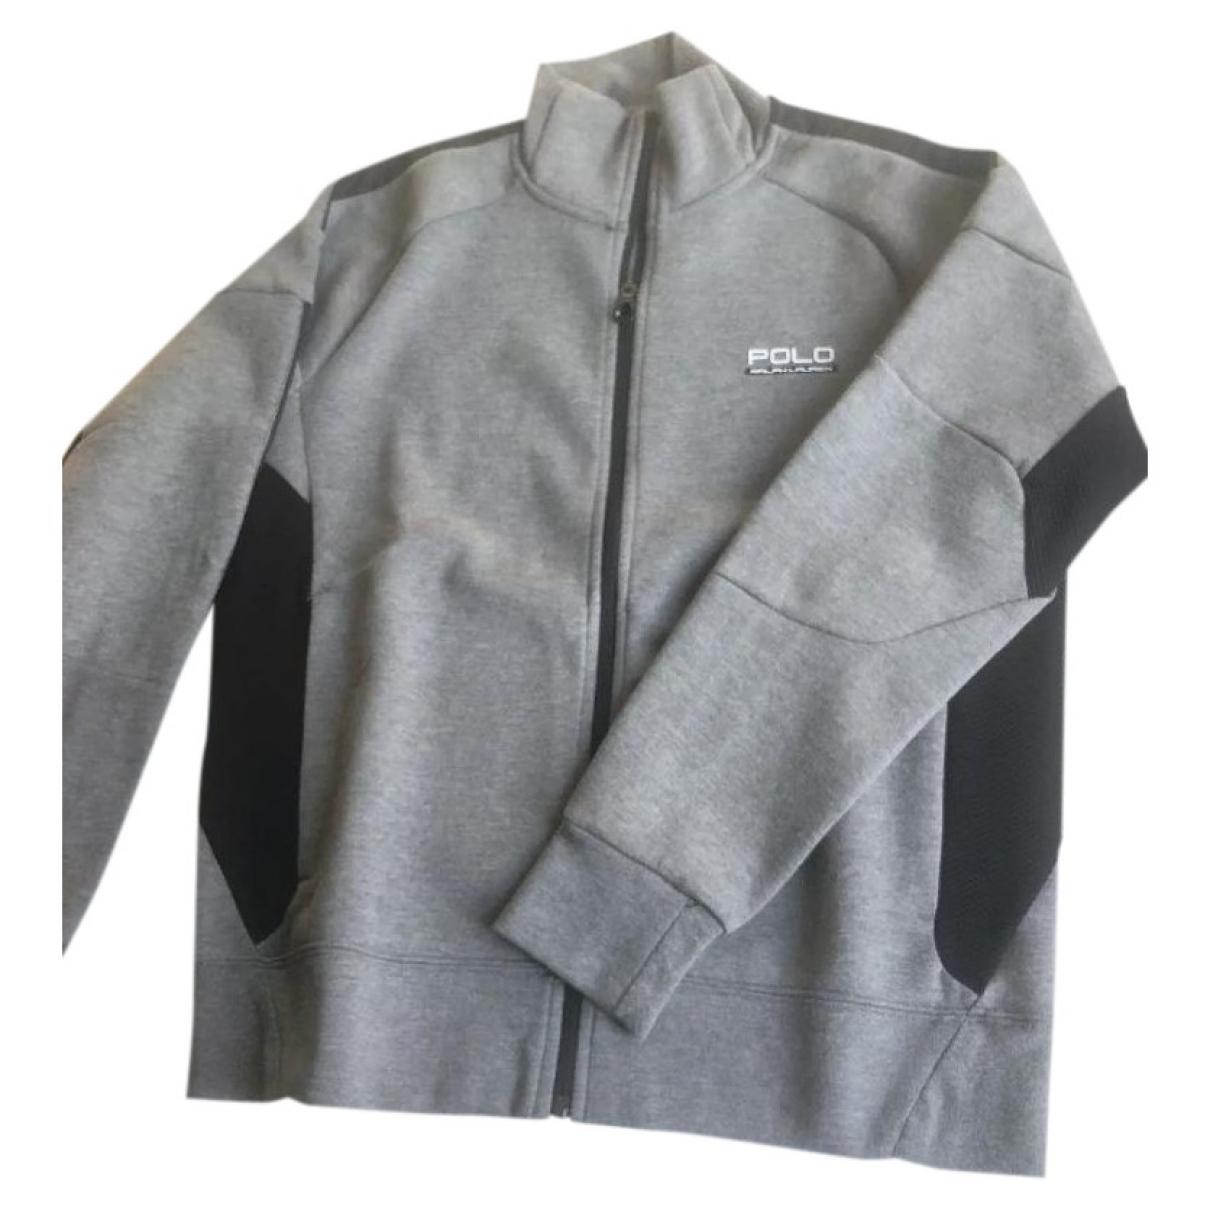 Polo Ralph Lauren \N Anthracite Cotton Knitwear & Sweatshirts for Men M International